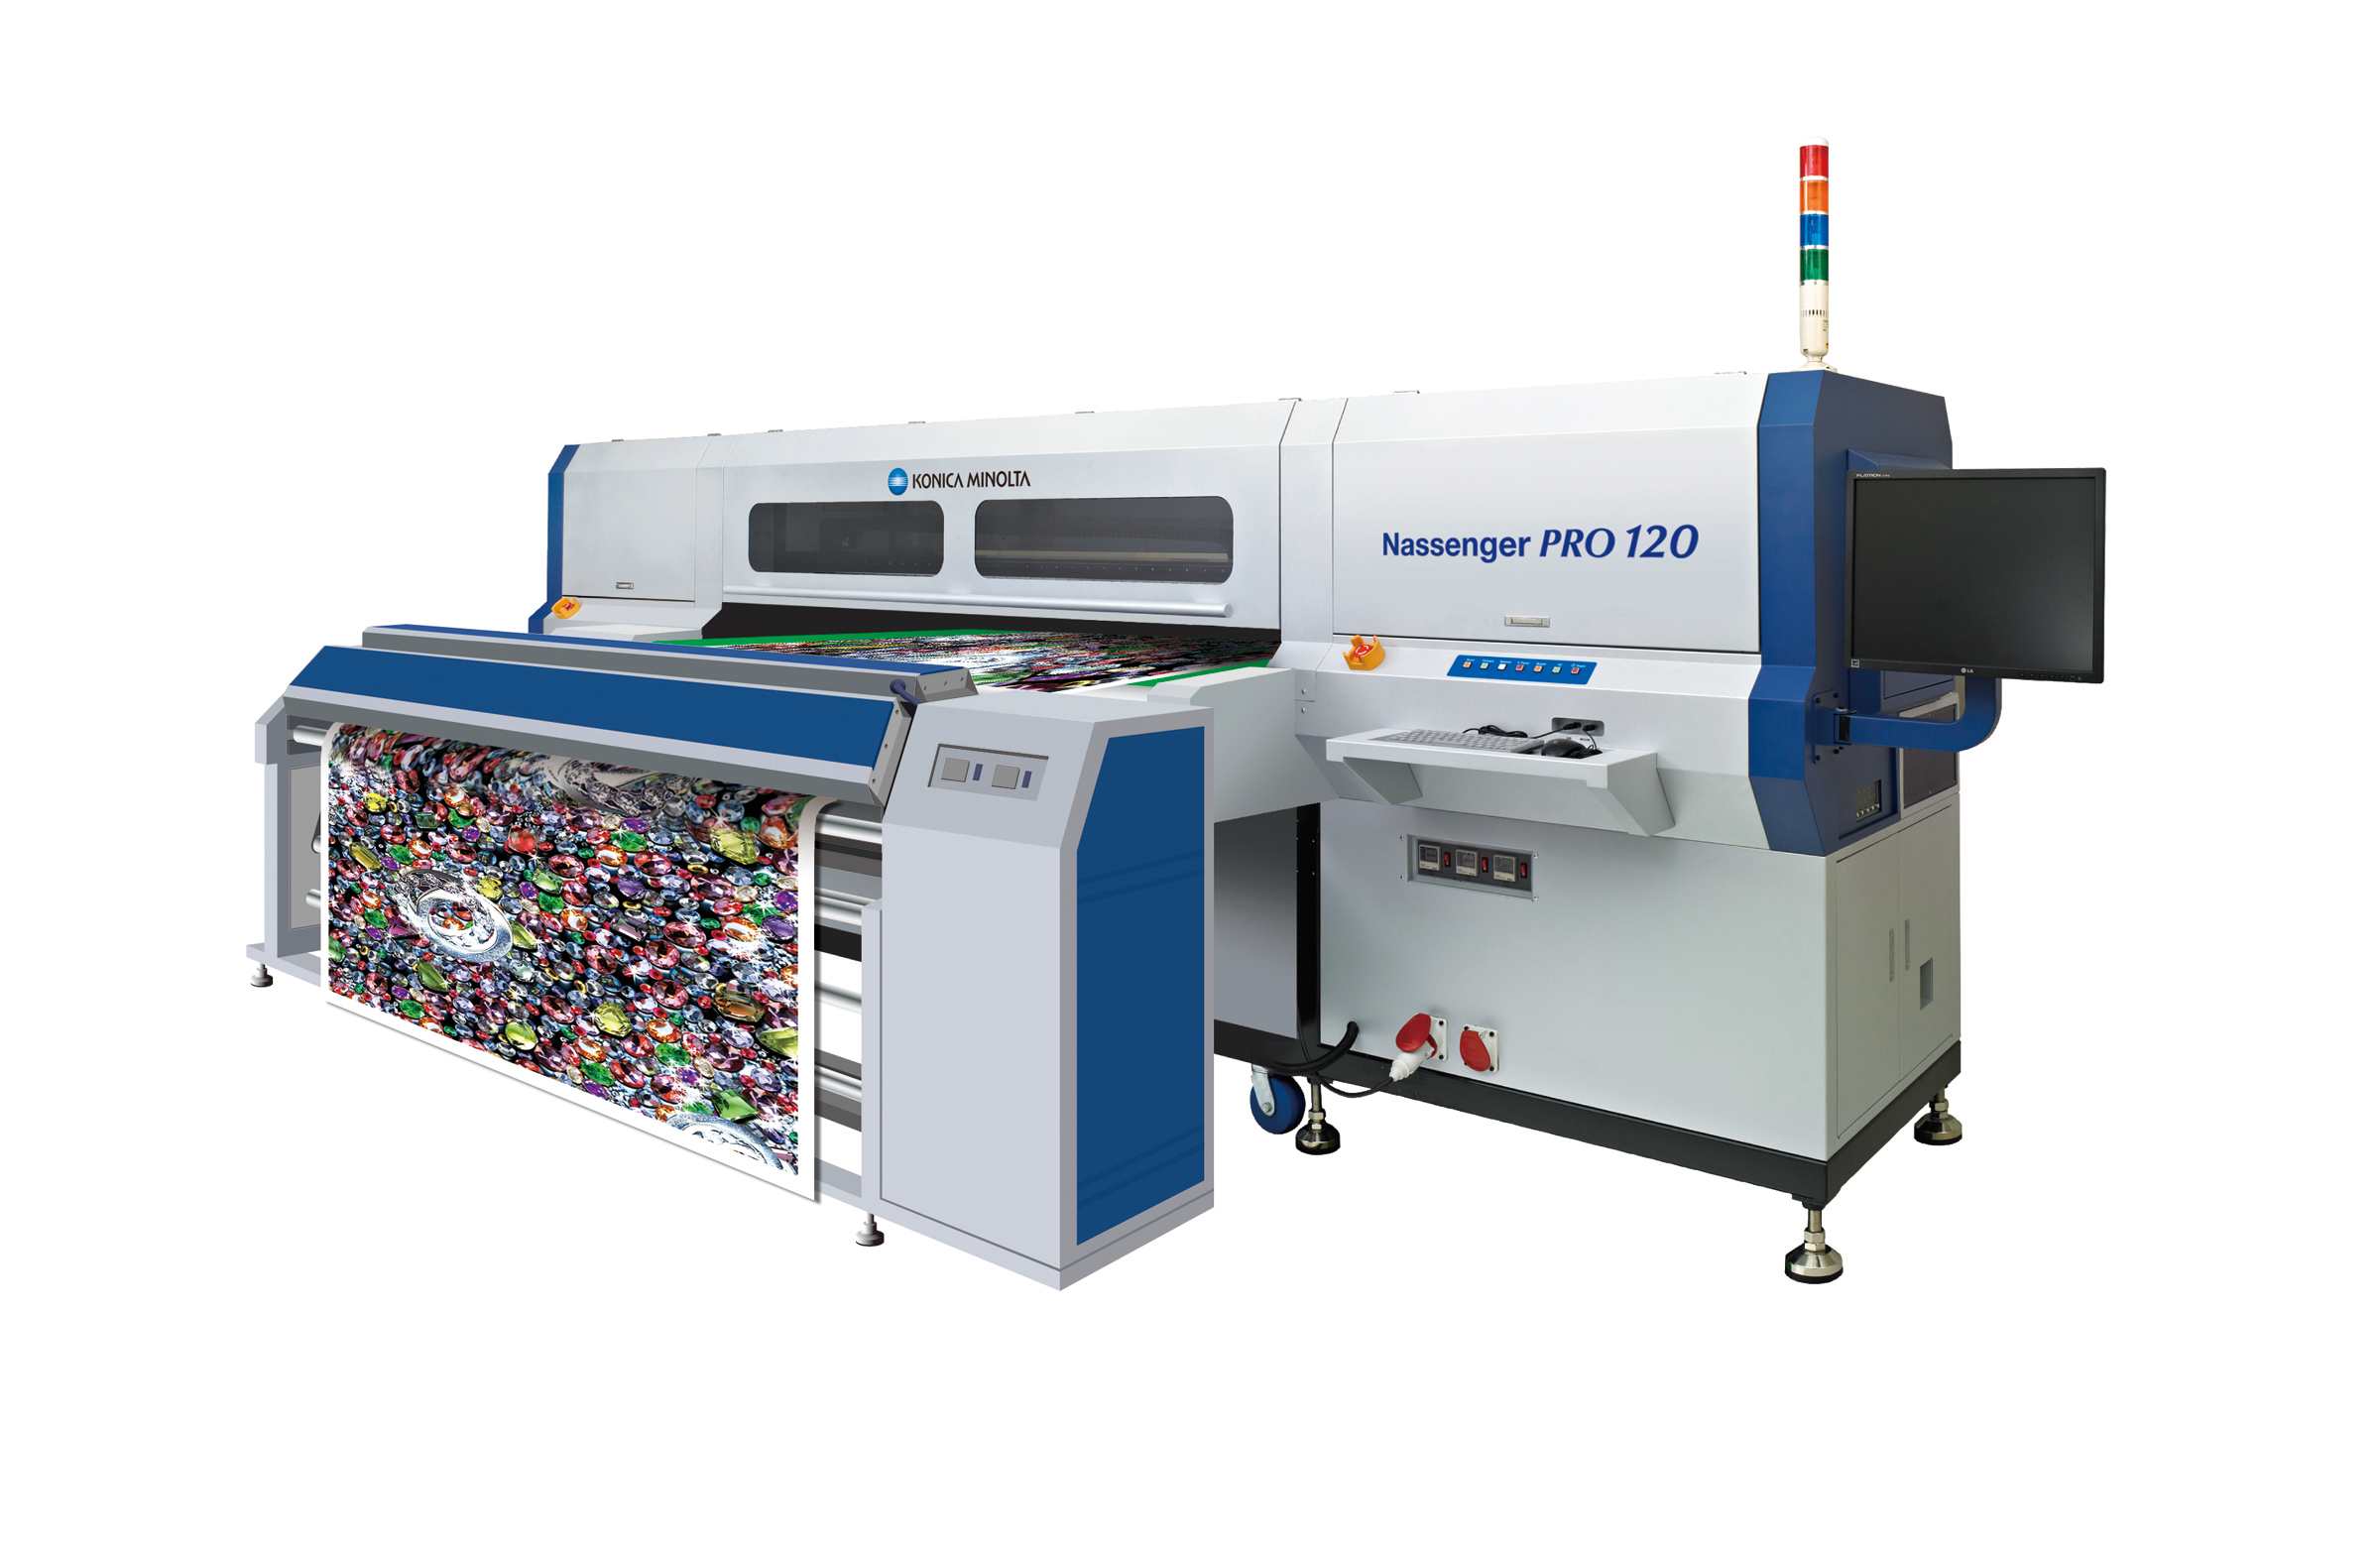 Konica Minolta to Unveil New Inkjet Textile Printer